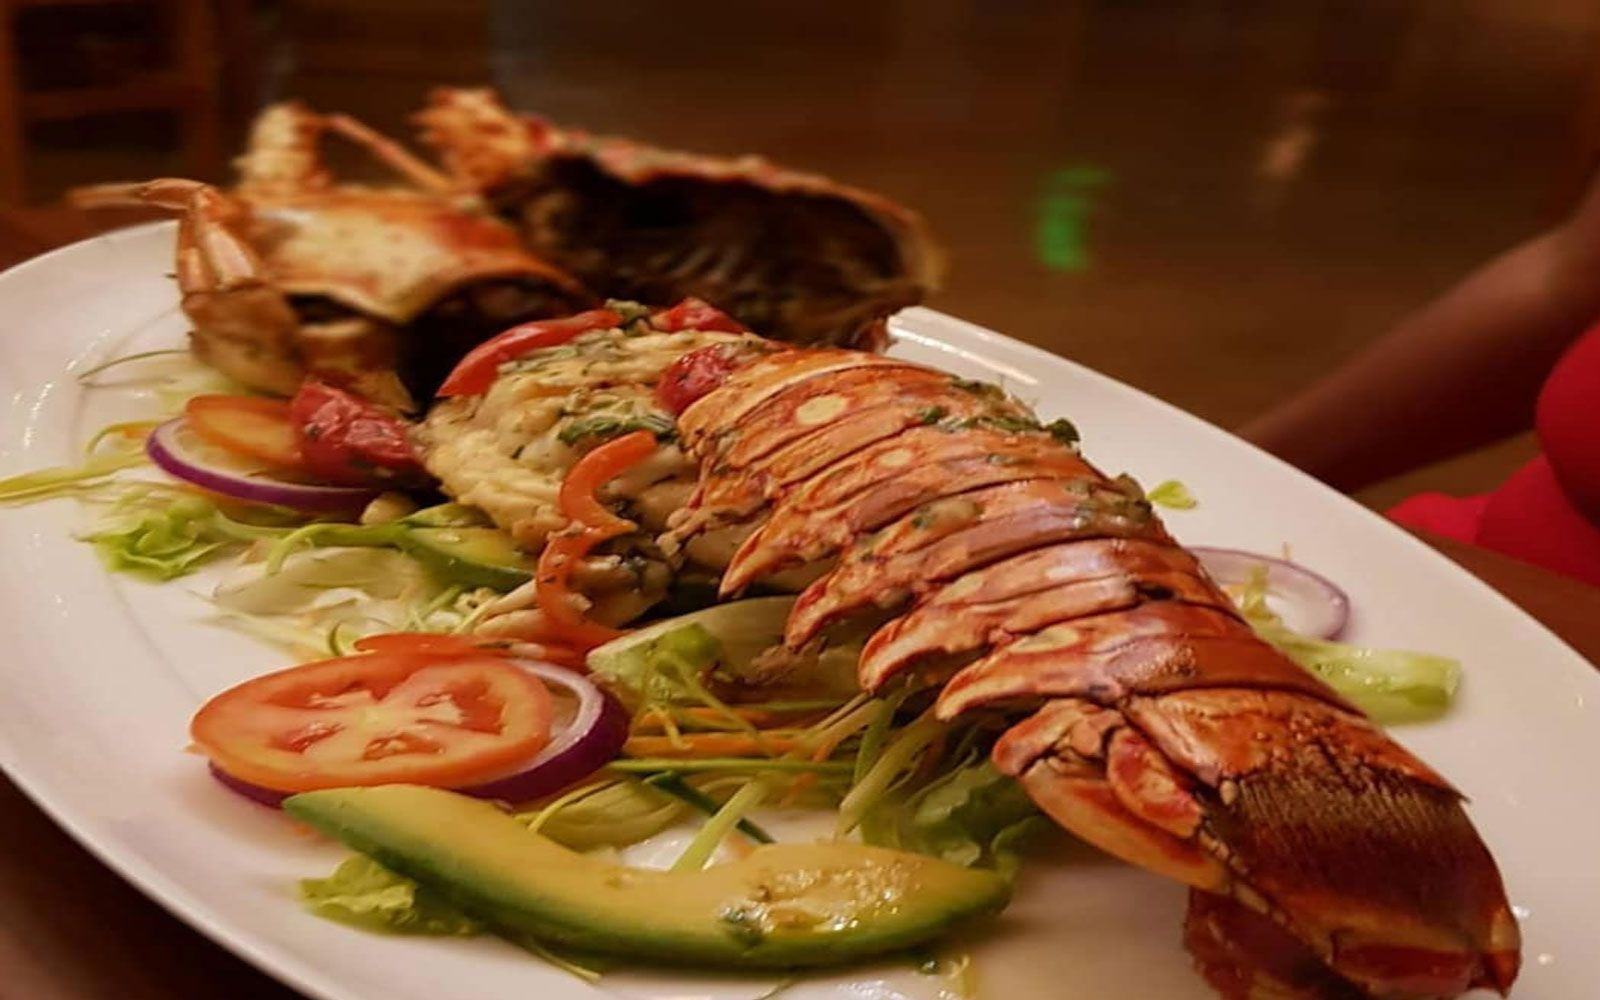 Seafood Restaurant In Trinidad And Tobago Near Me Now Seafood Restaurant Tapas Restaurant Chinese Restaurant